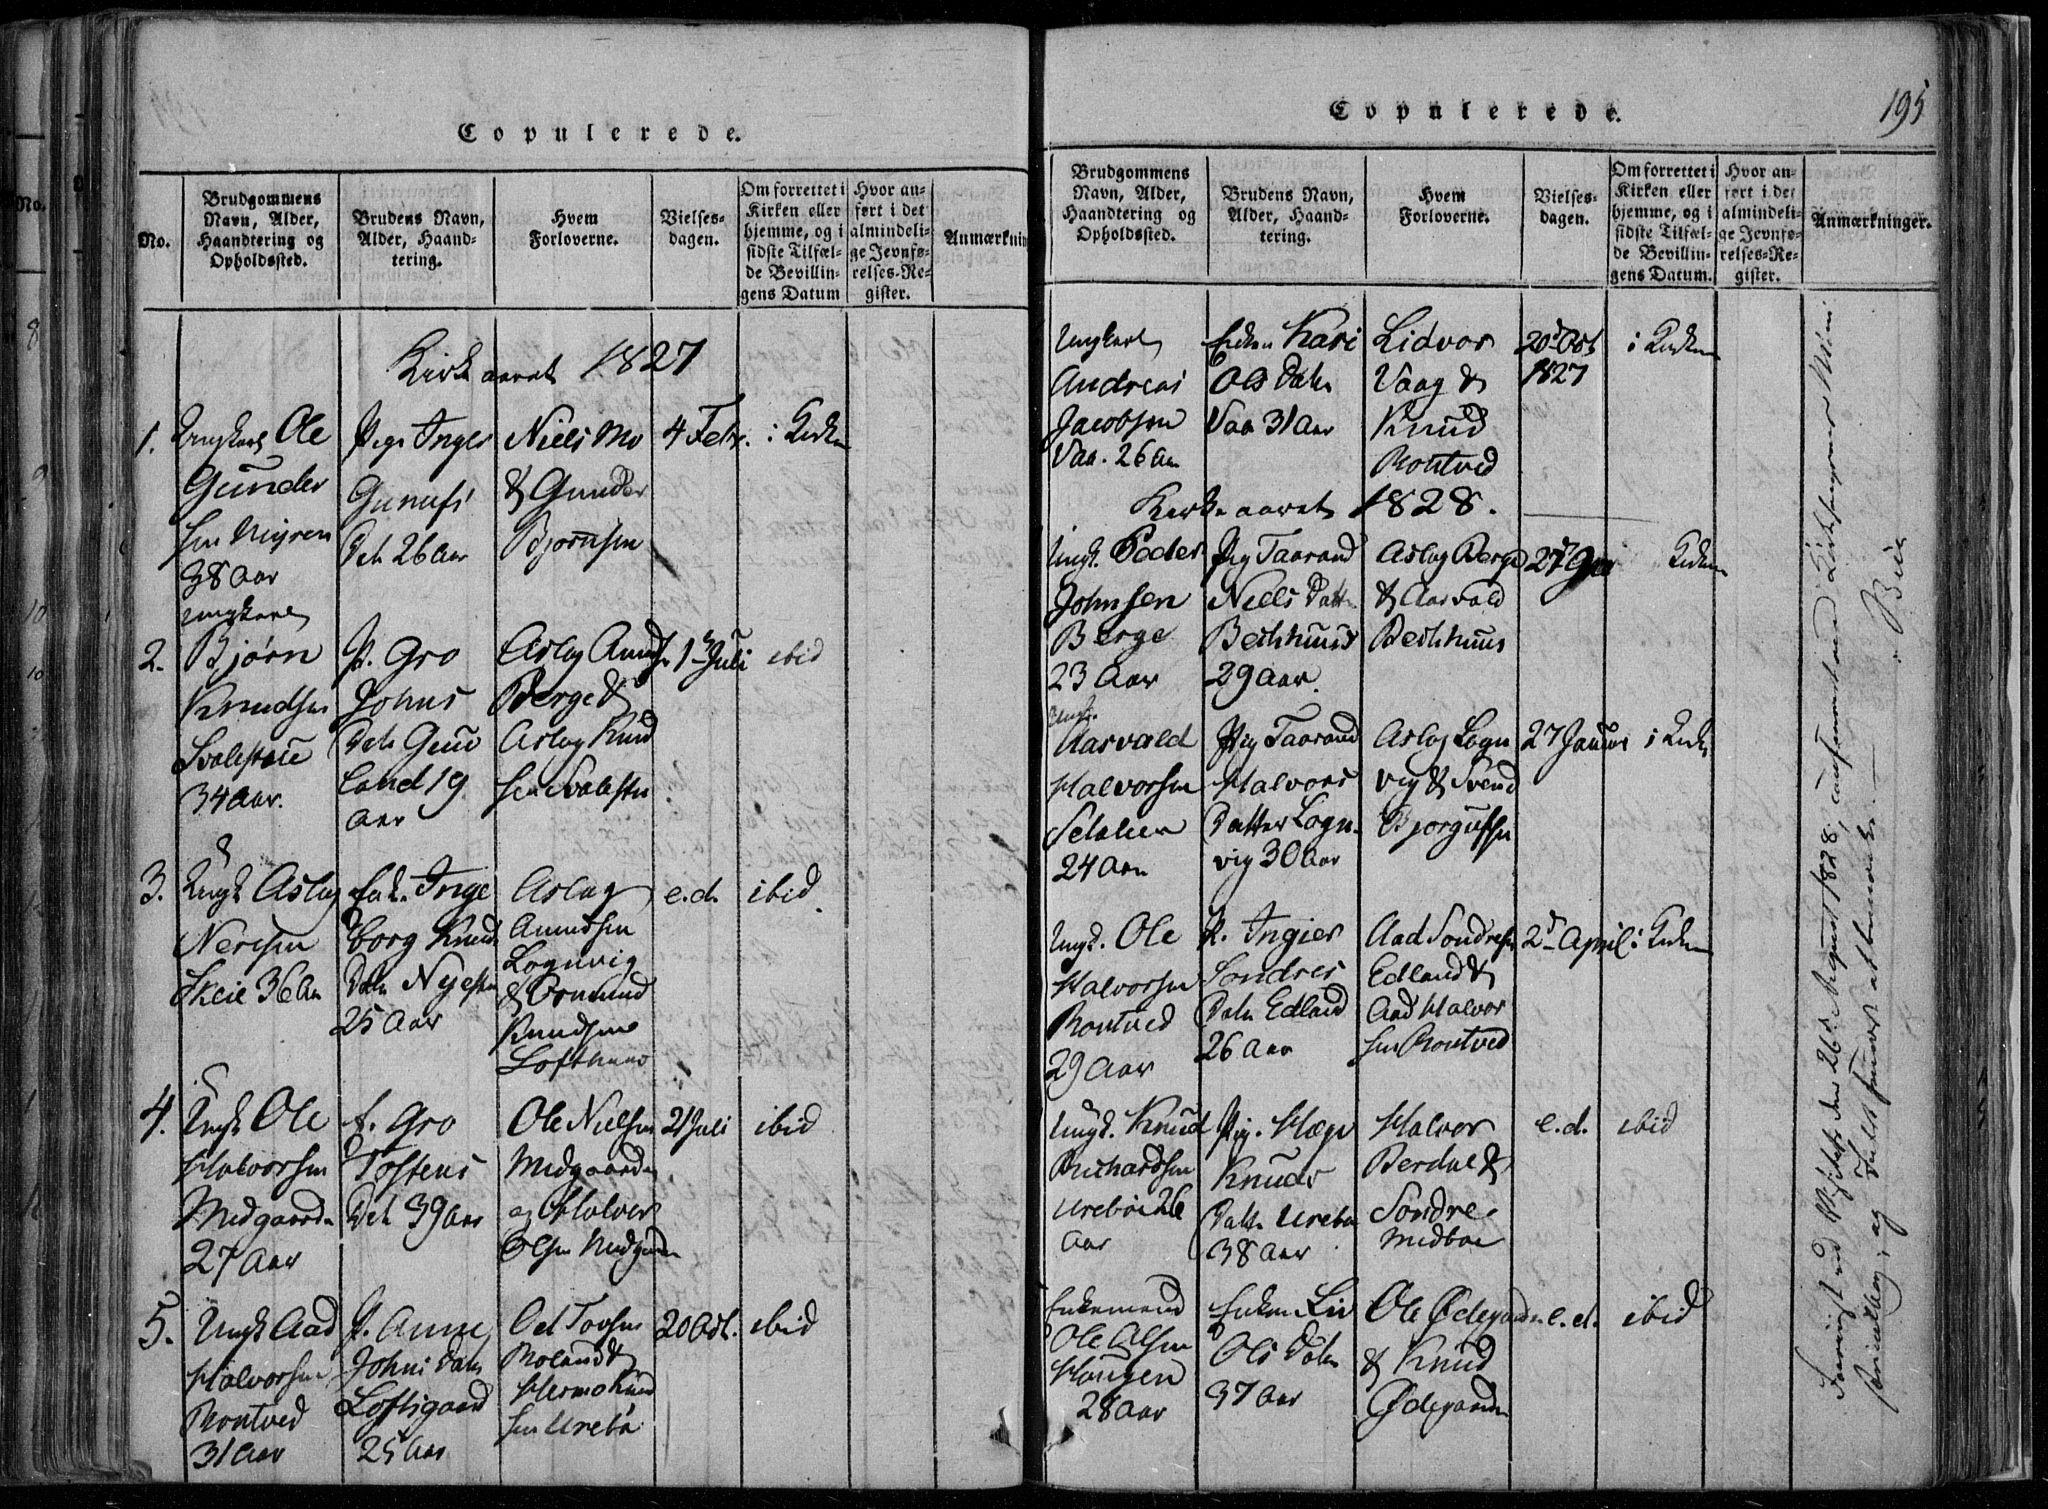 SAKO, Rauland kirkebøker, F/Fa/L0001: Ministerialbok nr. 1, 1814-1859, s. 195